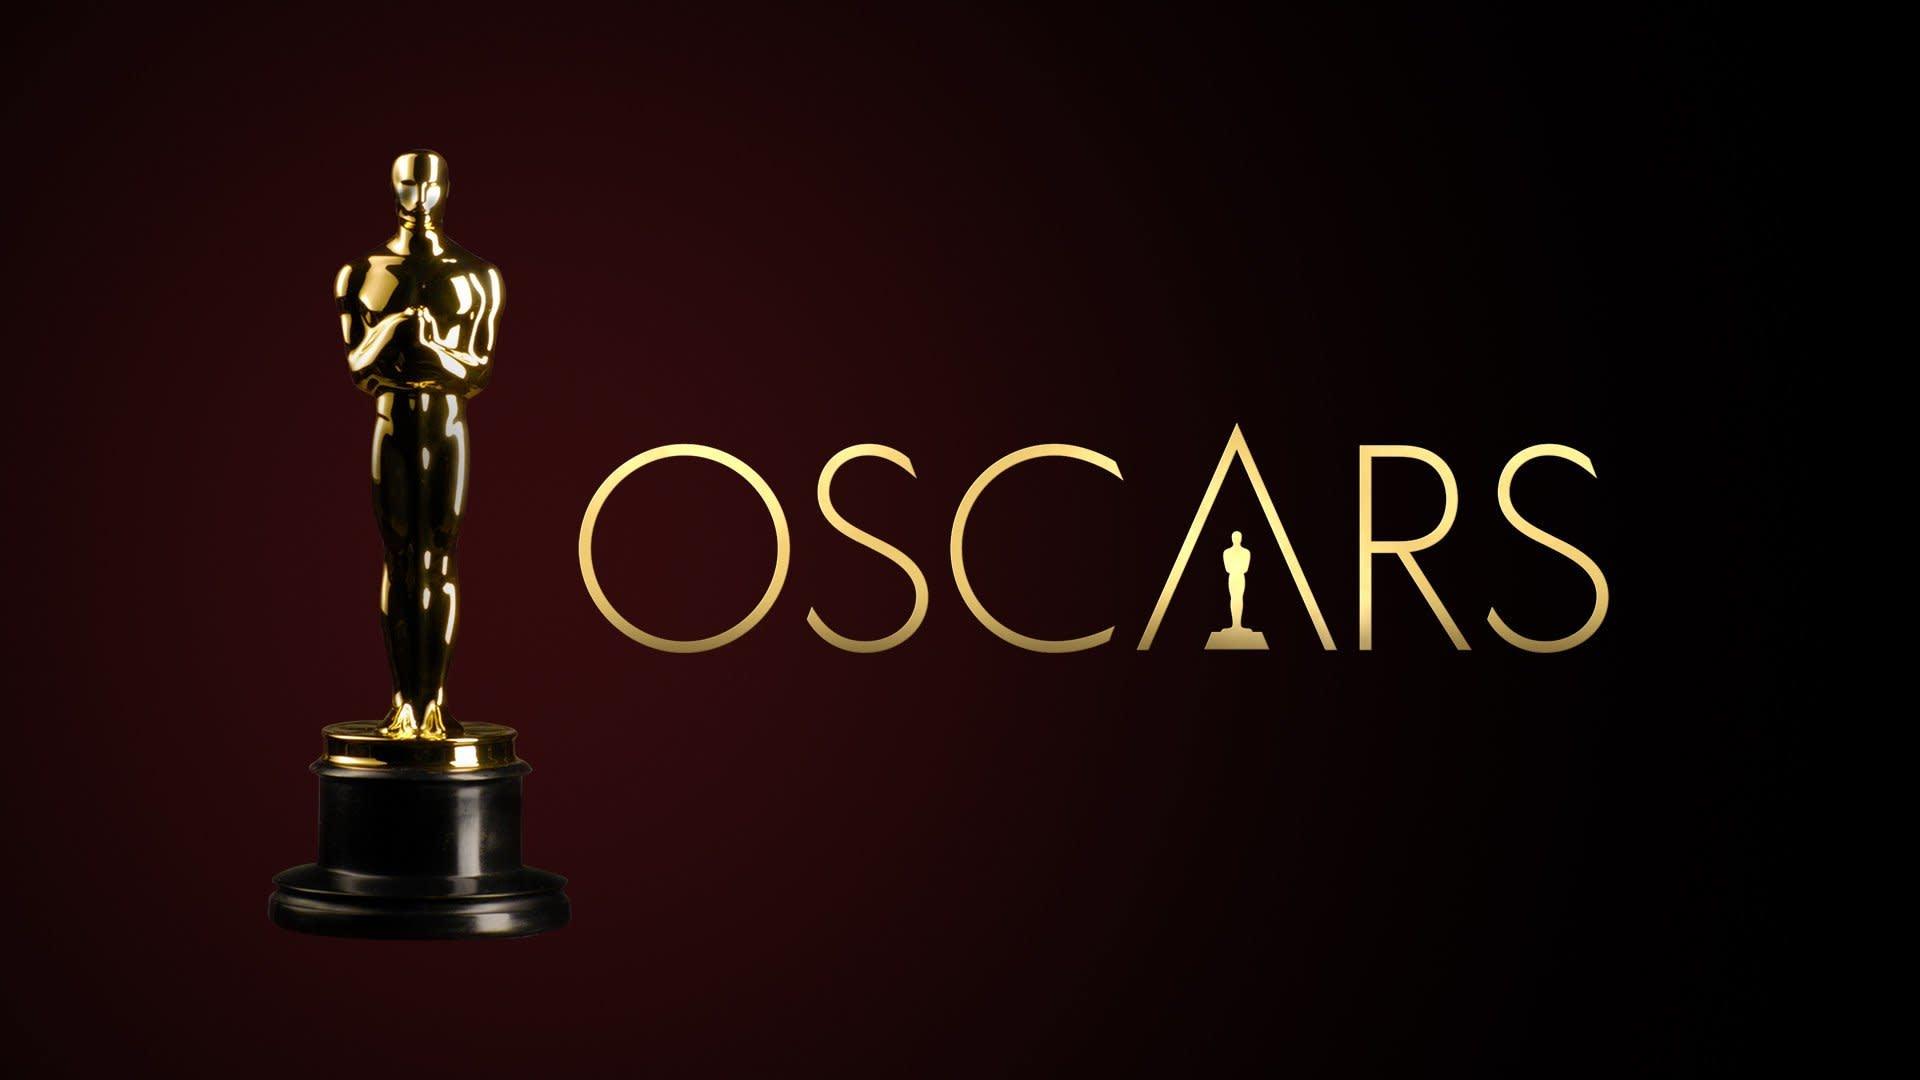 Peermusic congratulates Parasite on its 2020 Oscar wins